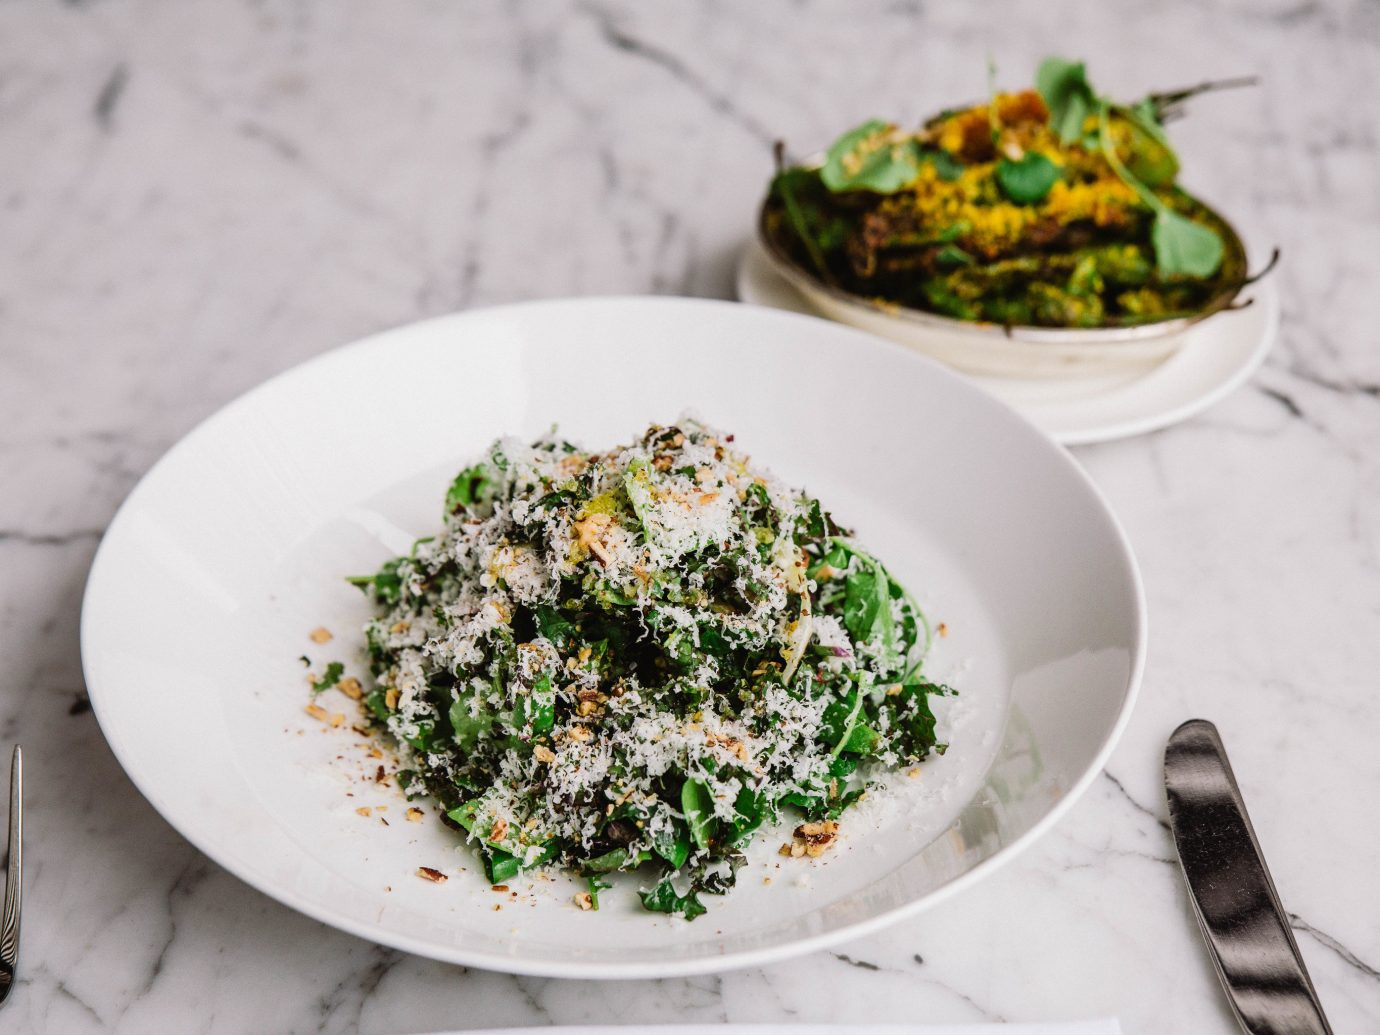 Food + Drink plate food dish vegetarian food leaf vegetable salad cuisine vegetable recipe rice meal